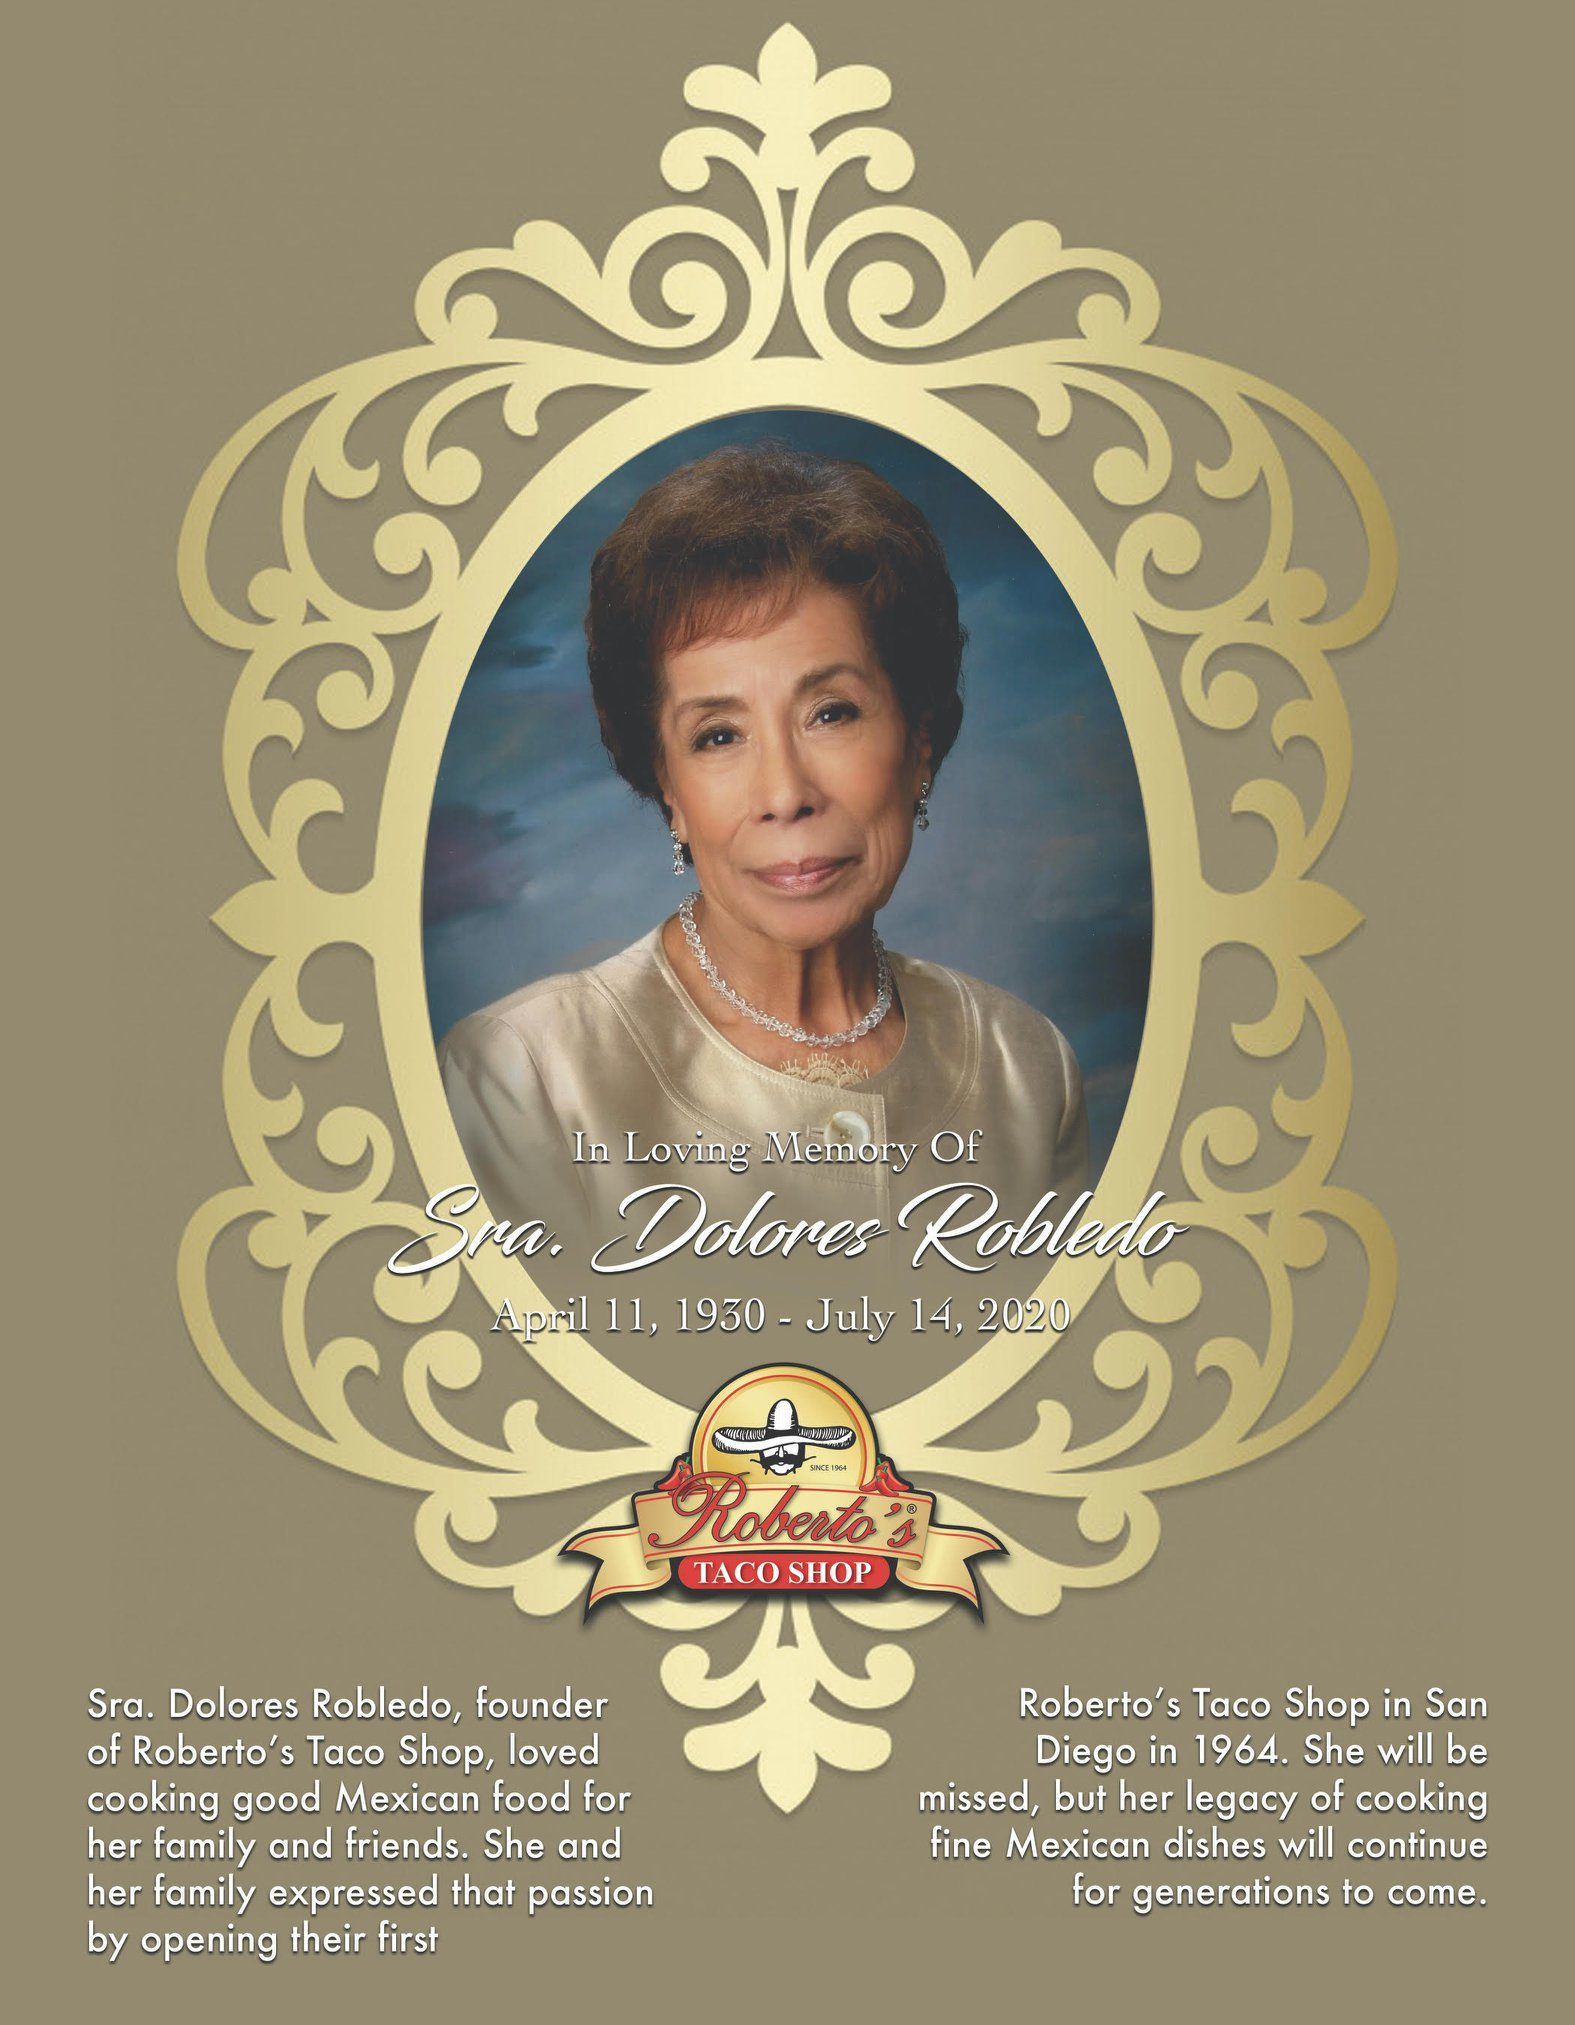 Dolores Robledo